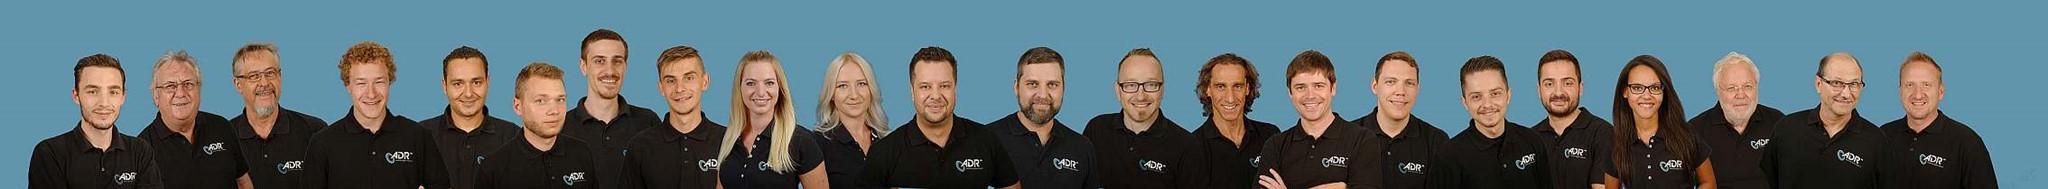 ADR Team